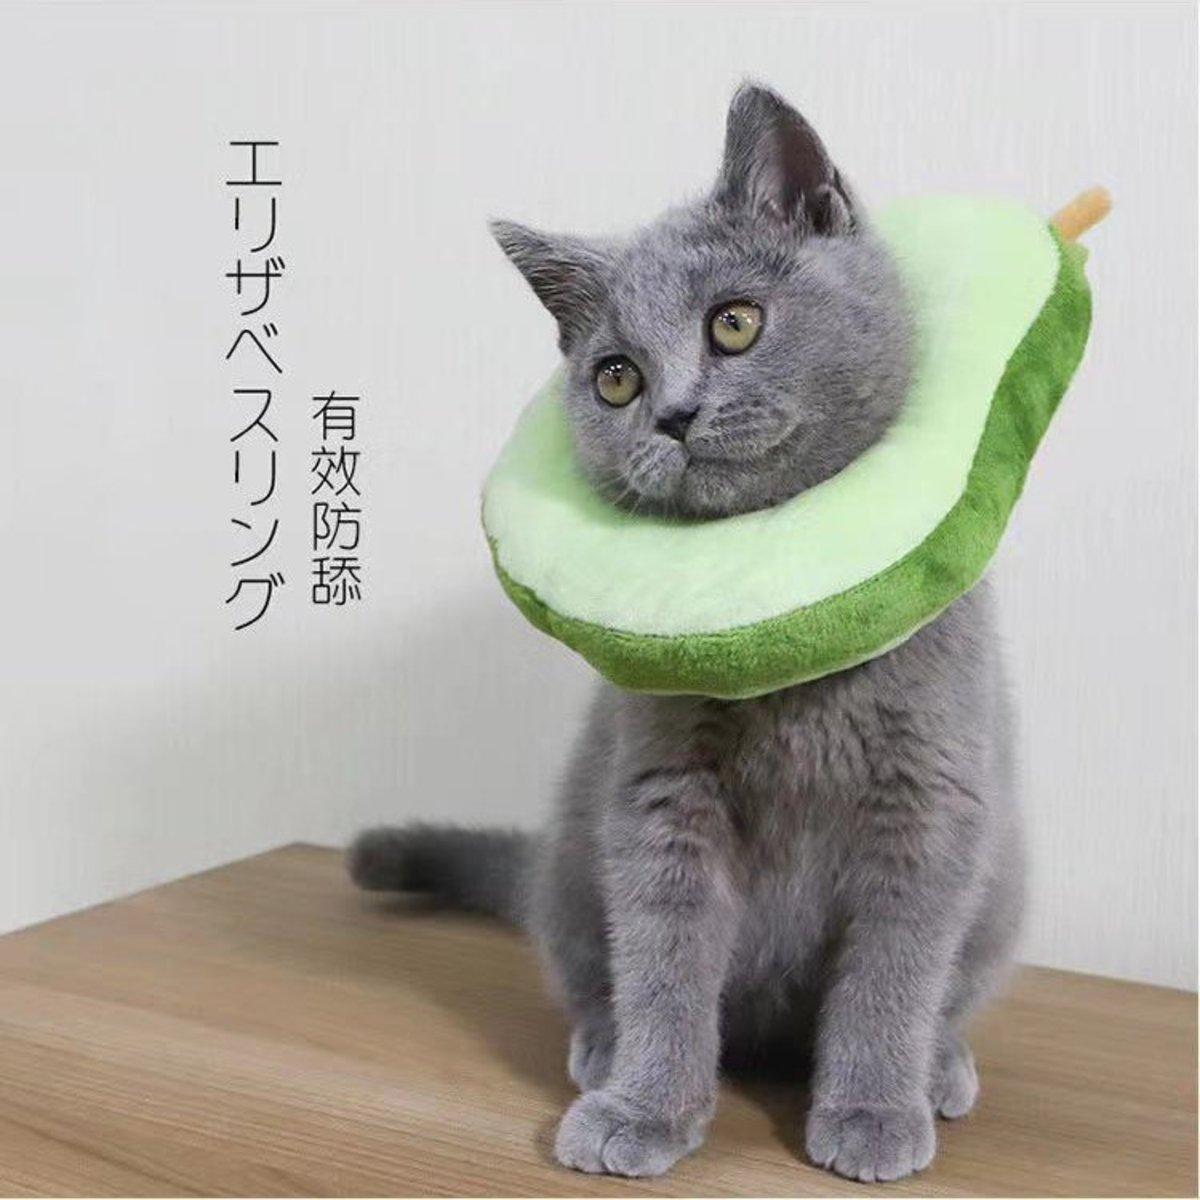 Anti-licking collar Elizabeth ring Shame ring-avocado shape Three Size (L)